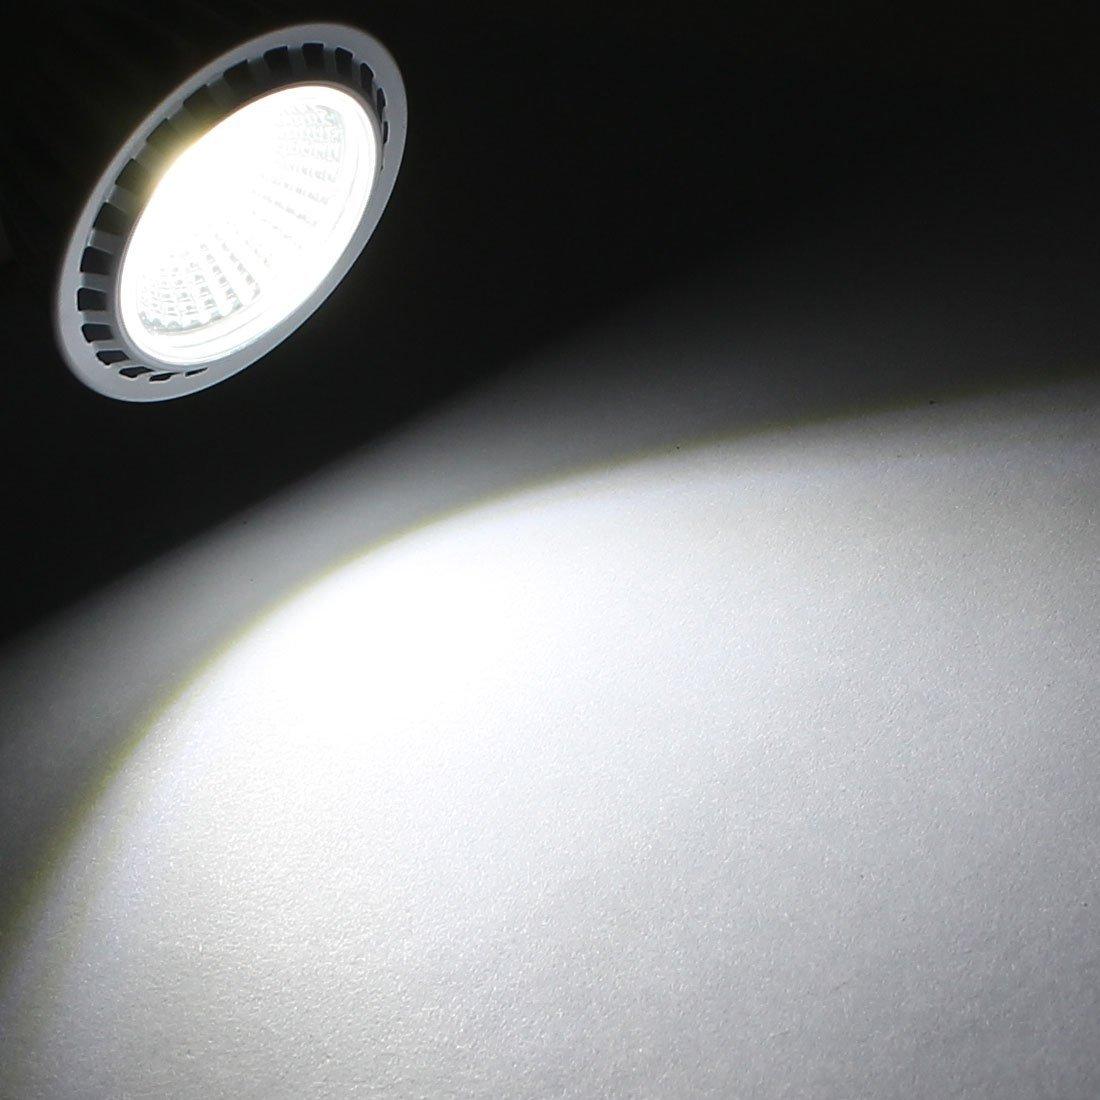 eDealMax AC85-265V 3W COB Ultra brillante LED GU10 bombilla de la lámpara empotrada blanco puro - - Amazon.com